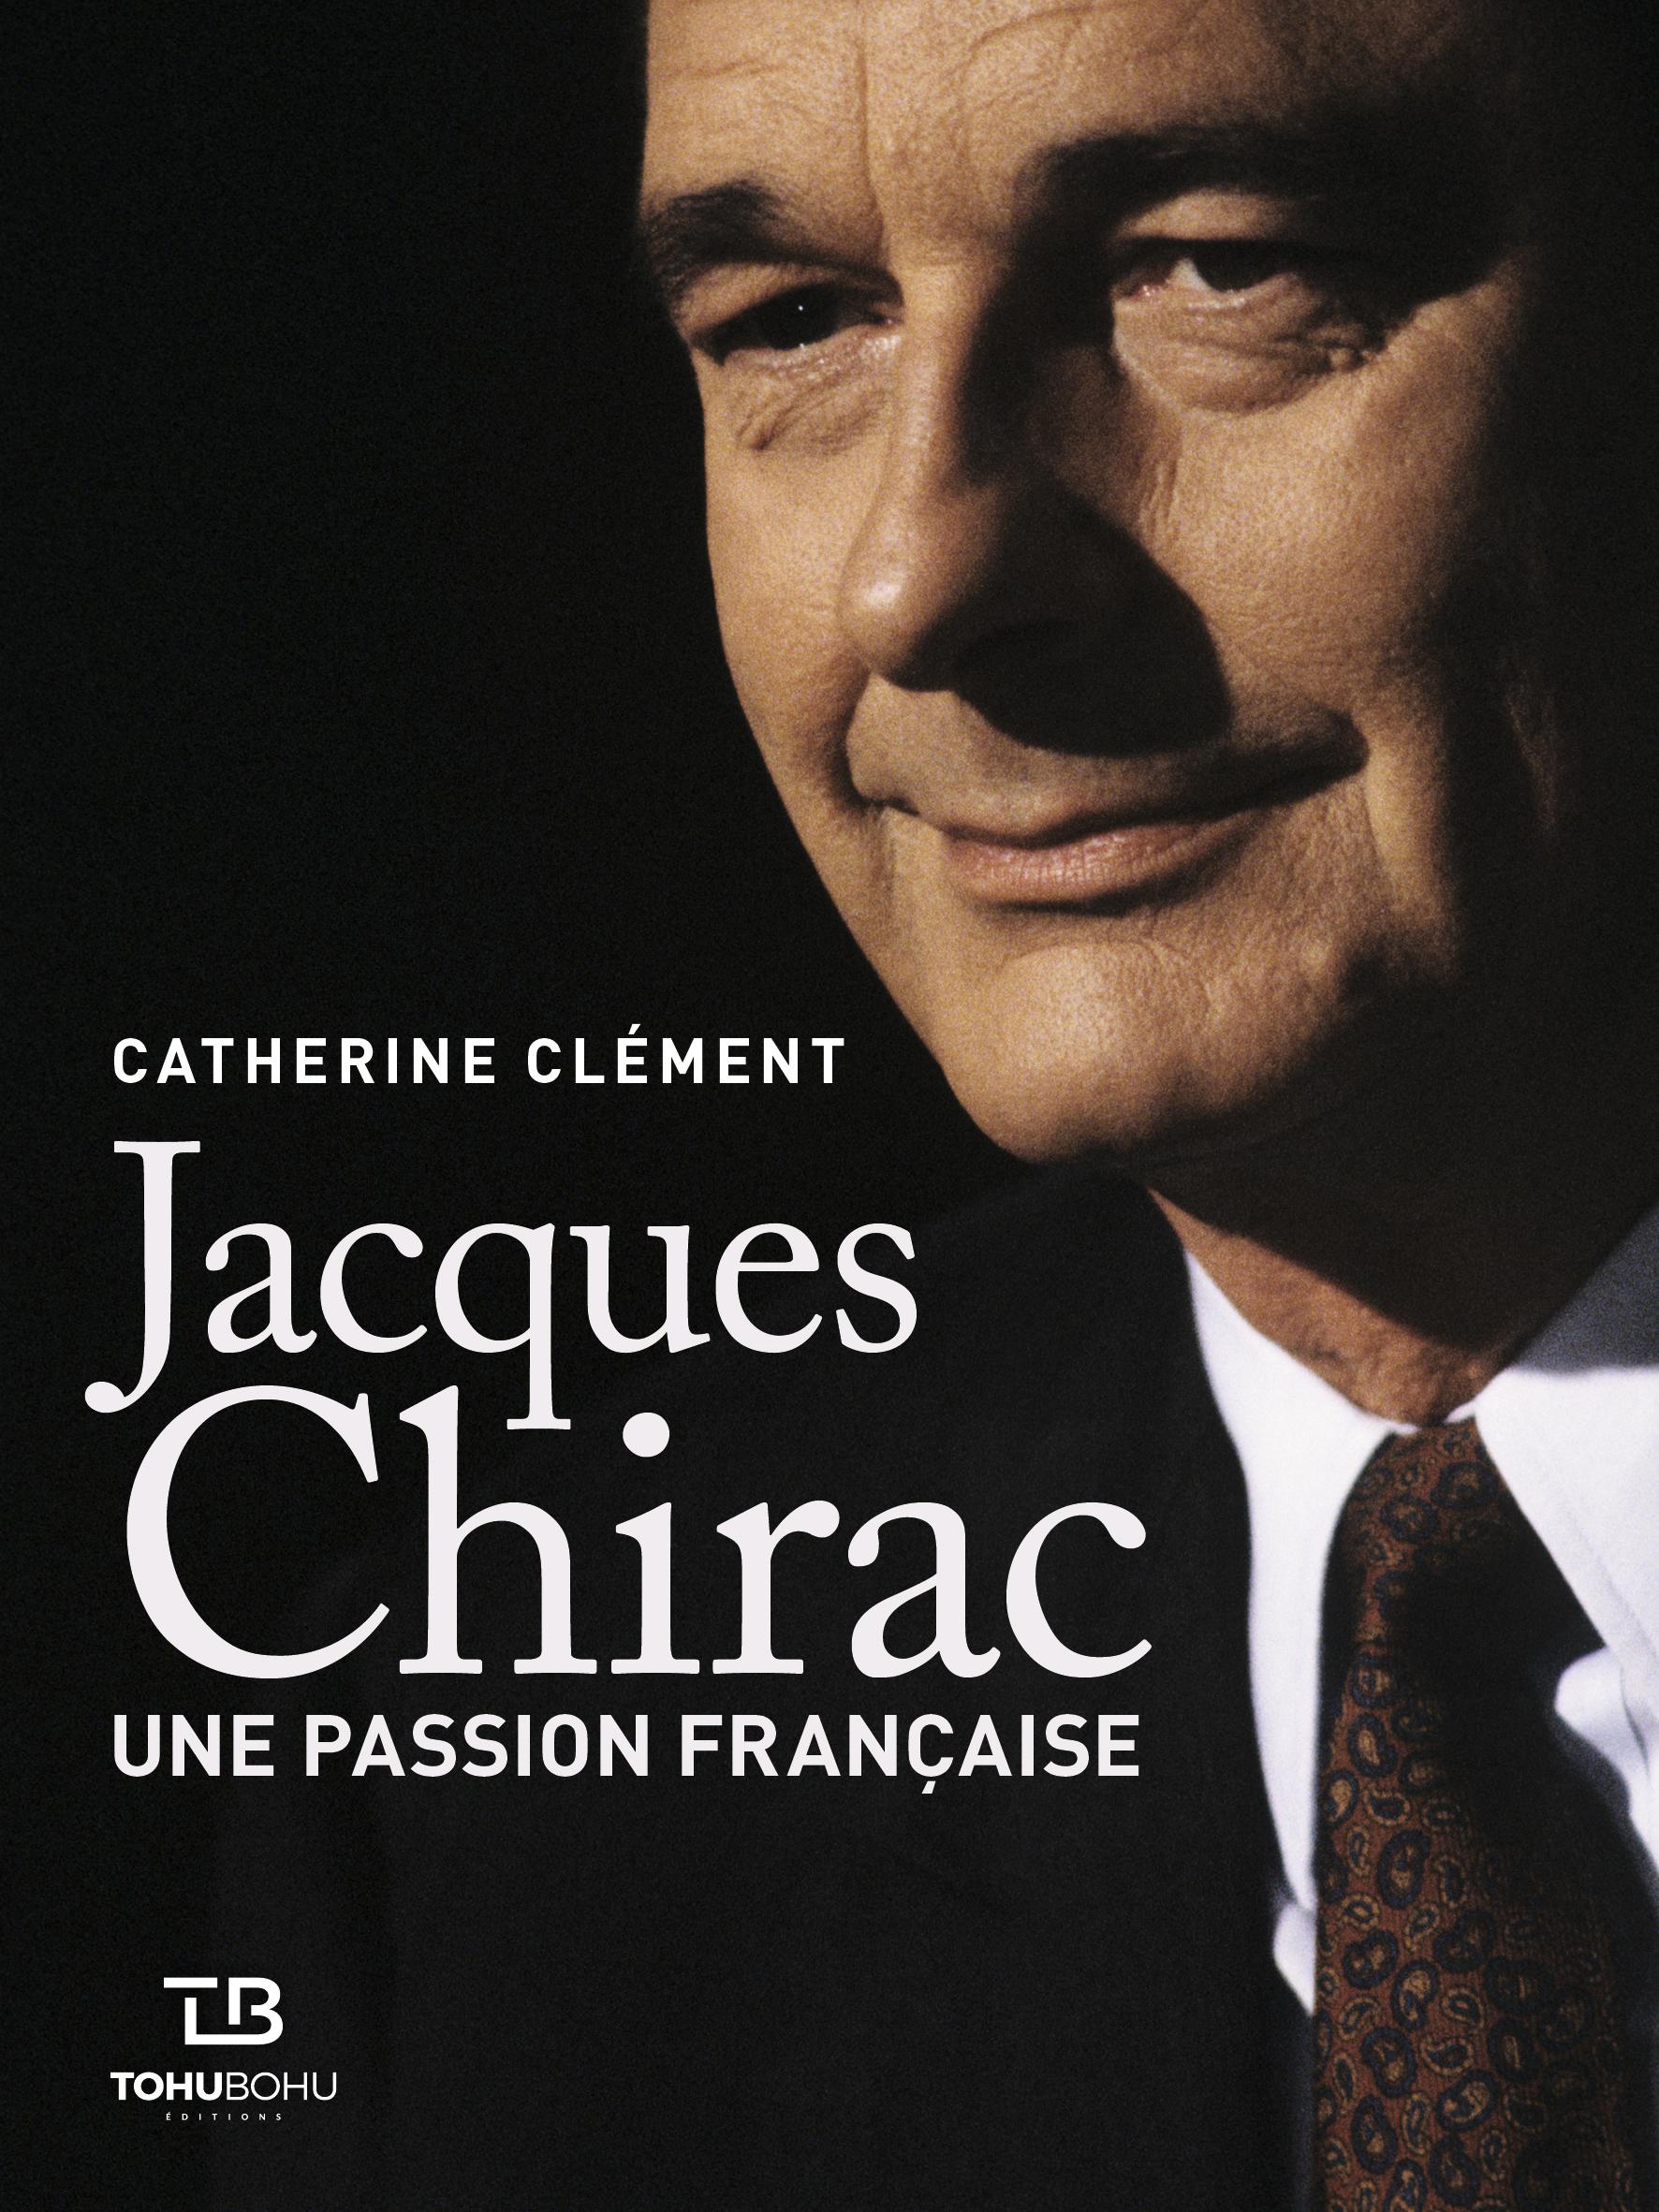 CHIRAC UNE PASSION FRANCAISE